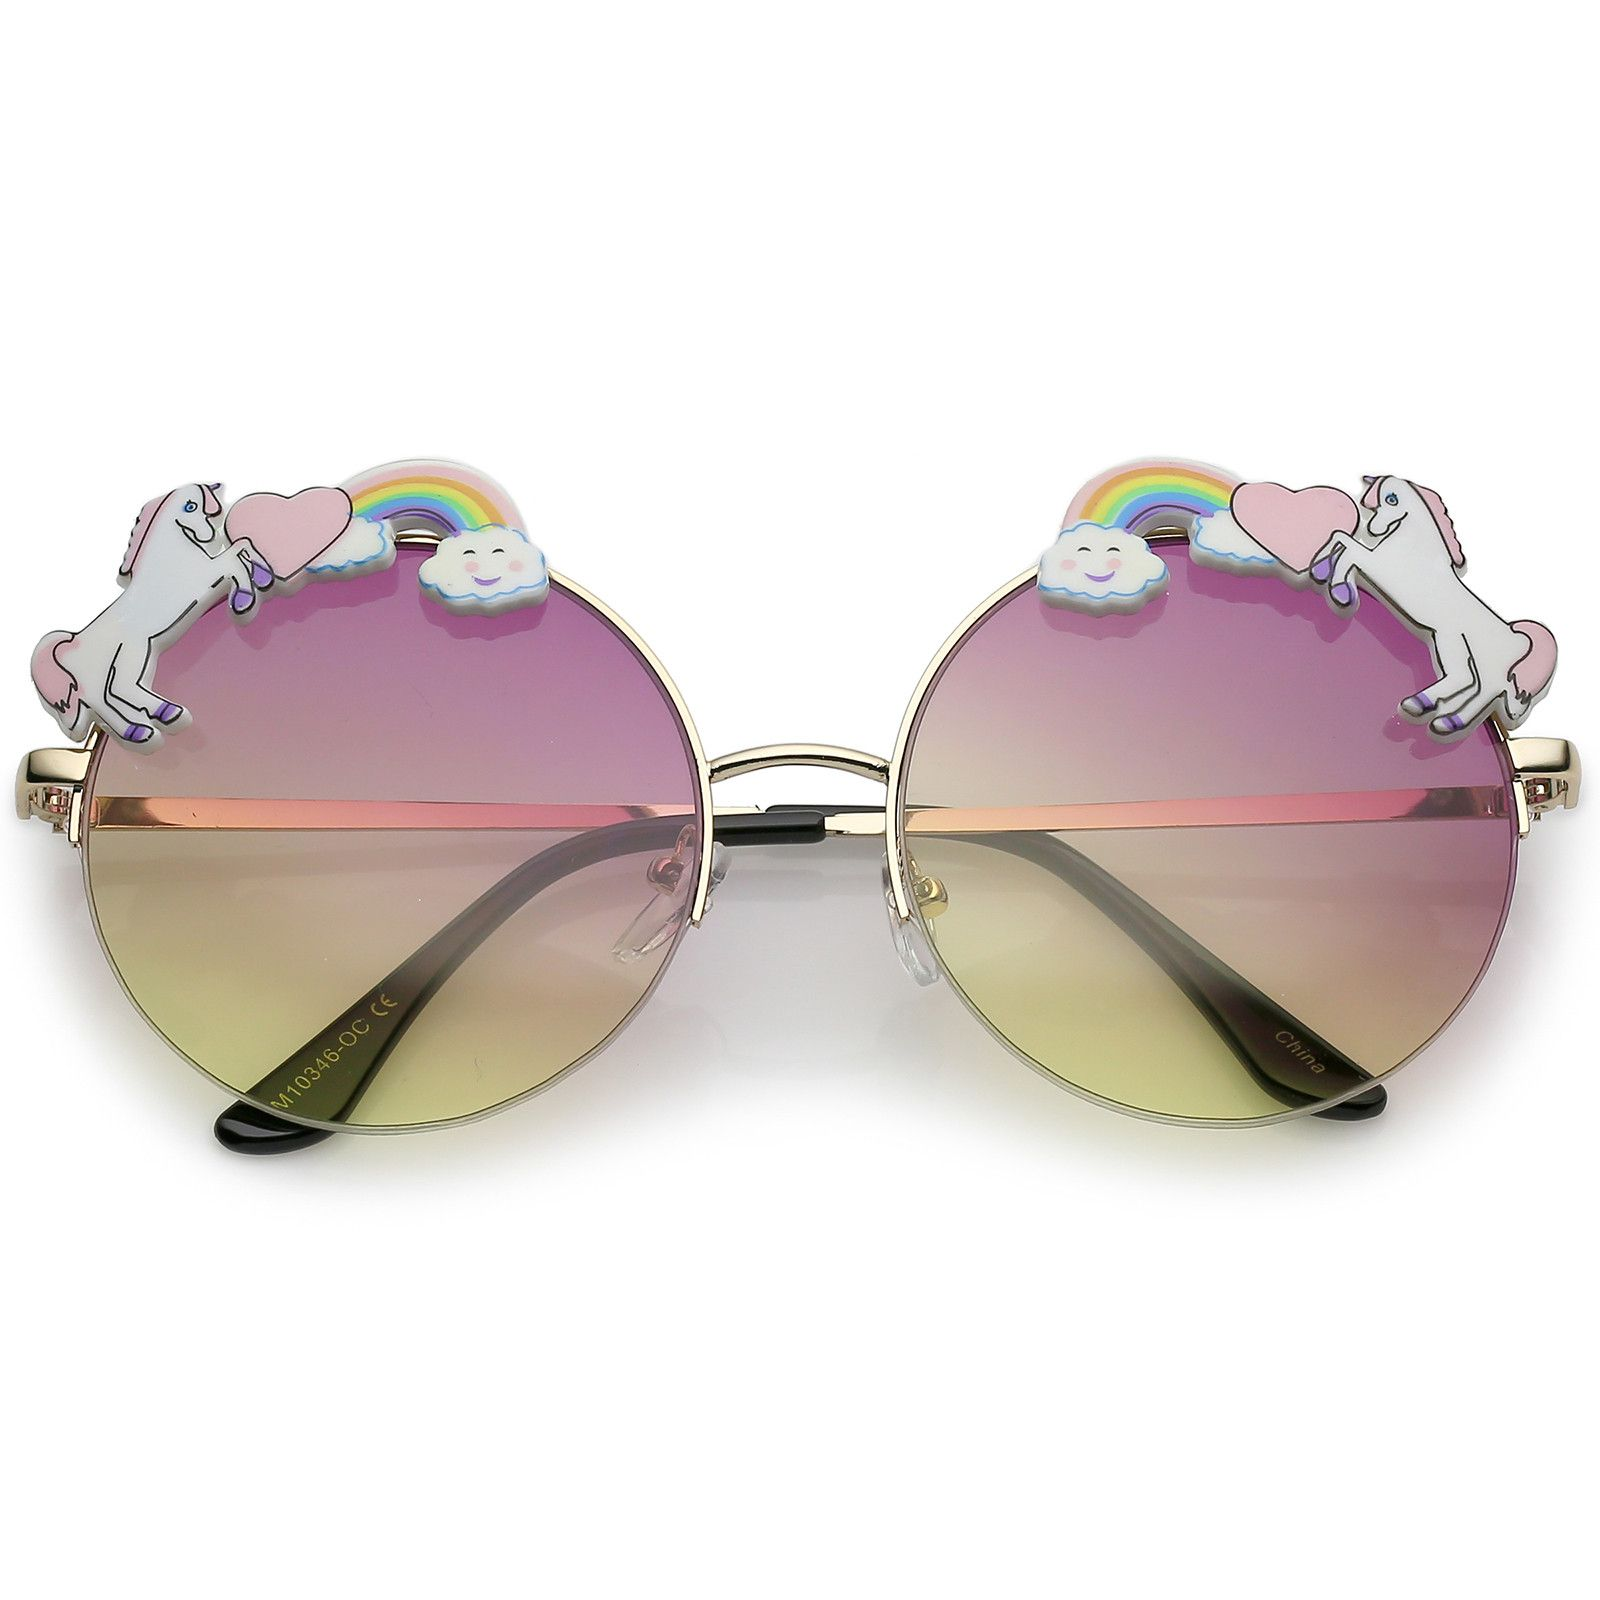 f85651050b Unicorn Rainbow Semi Rimless Round Sunglasses With Gradient Colored Lens  56mm #frame #sunglasses #sunglass #summer #bold #oversized #purple  #sunglassla ...